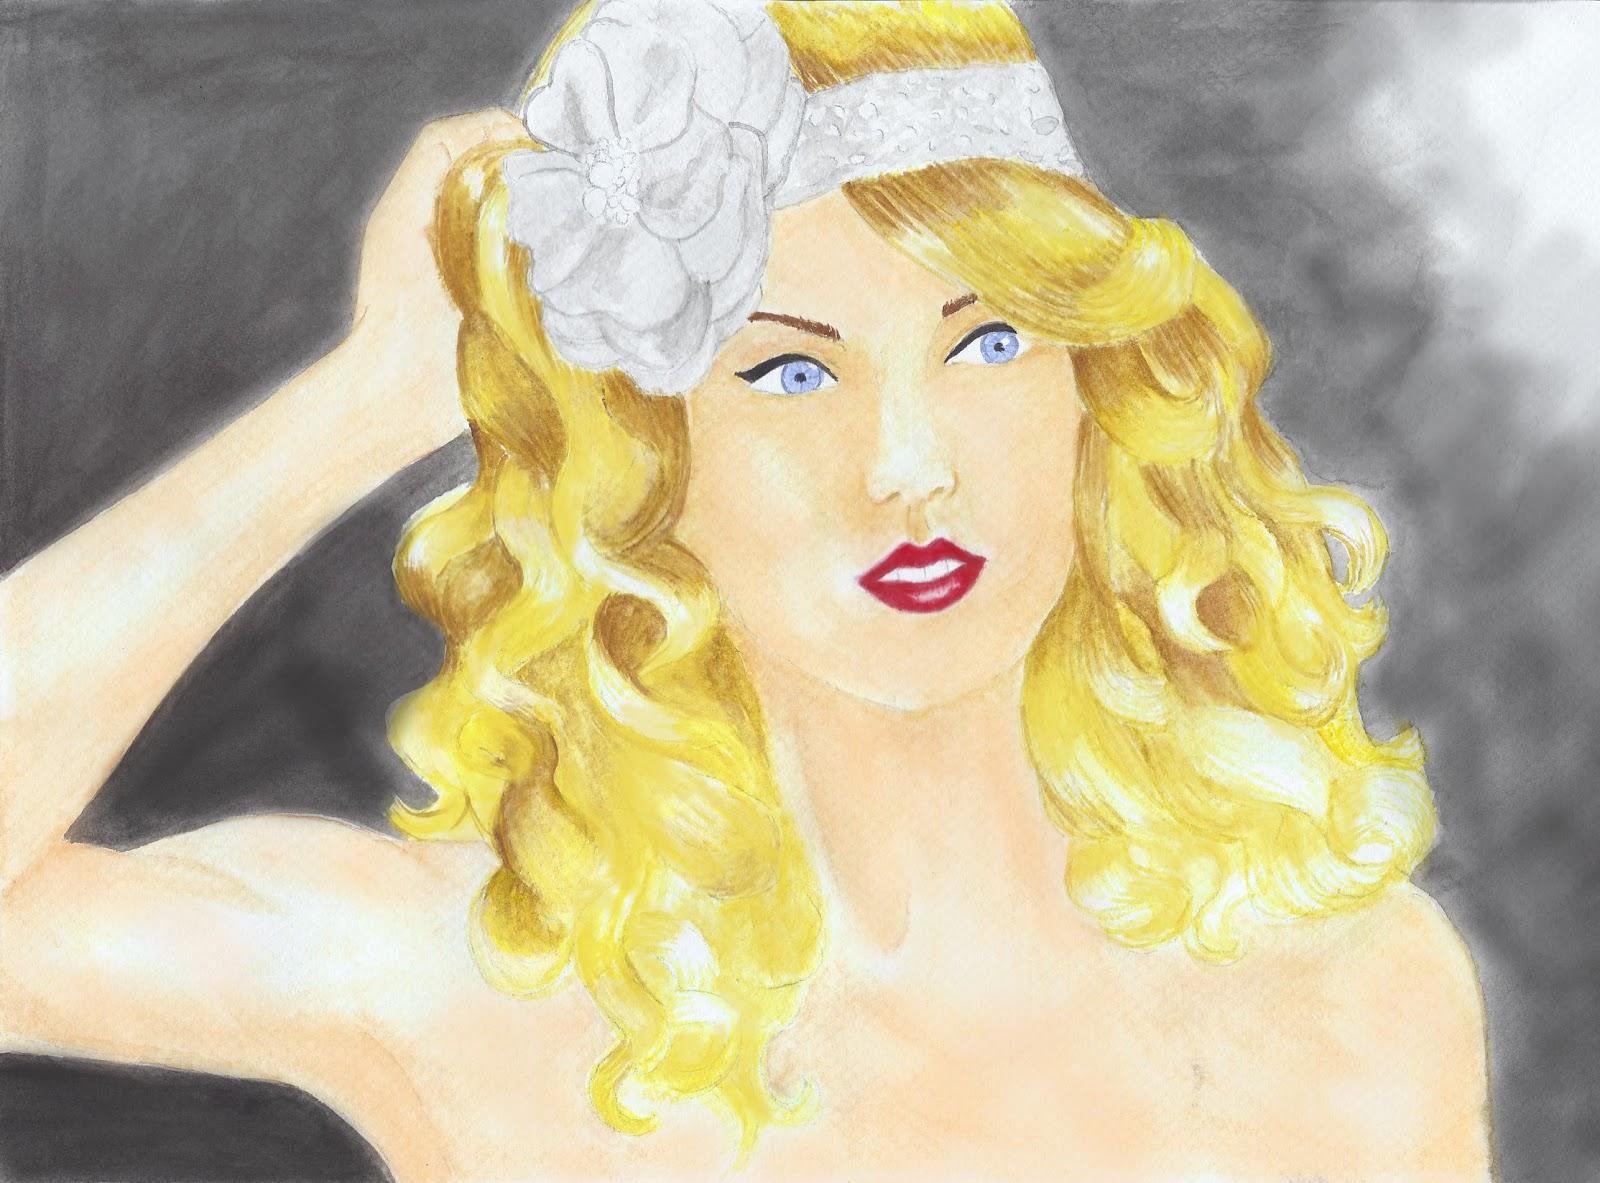 http://3.bp.blogspot.com/-22cenoLCY0U/UHrHY9qJwbI/AAAAAAAAAp4/g_ekQ6h_004/s1600/andy+4.jpg